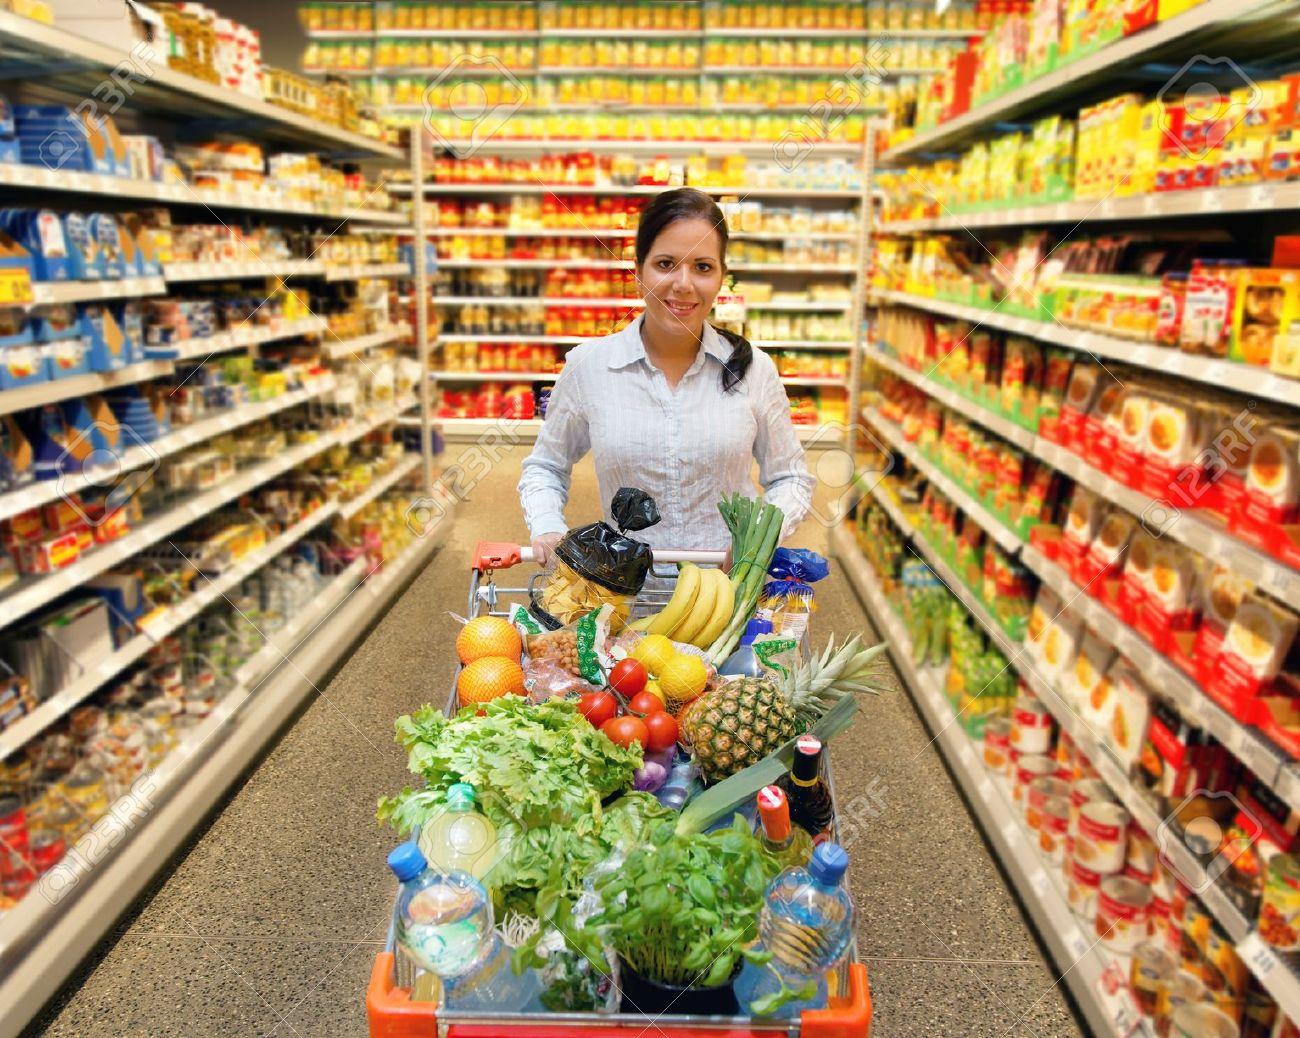 Bilderesultat for woman with shopping basket